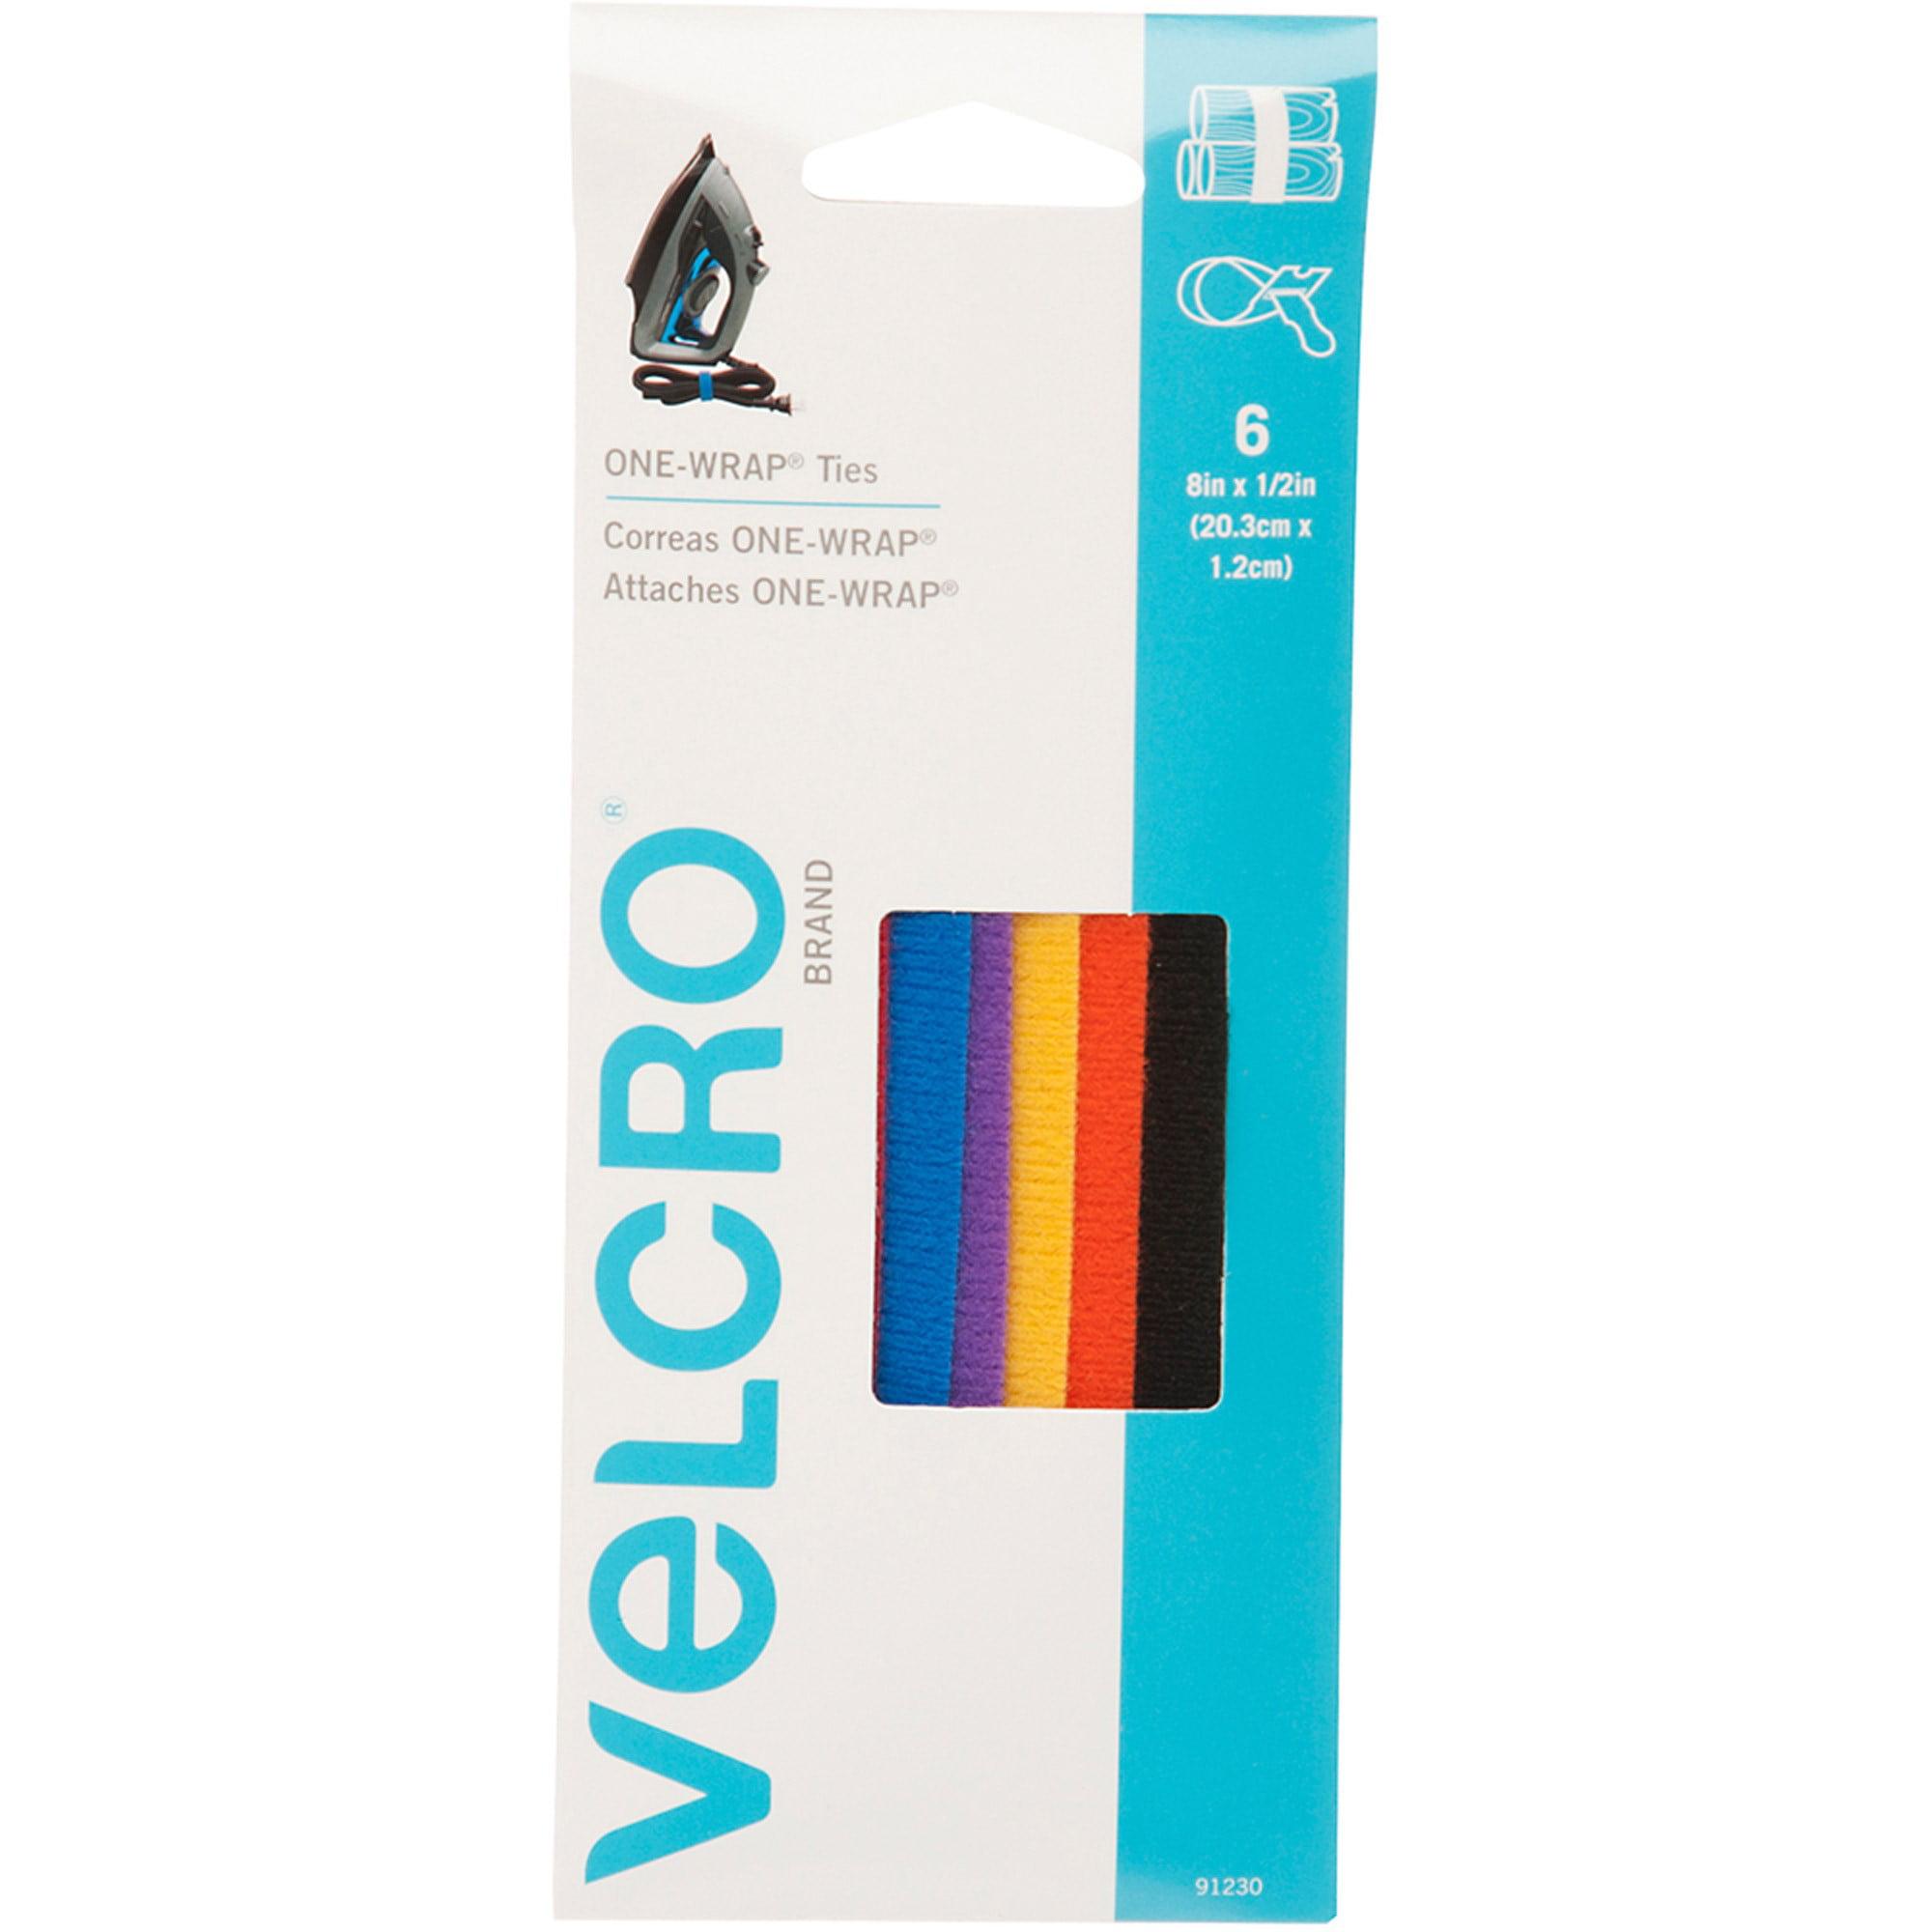 "VELCRO Brand ONE-WRAP 8"" x 1/2"" Multi-Color Tie, 6 Count"